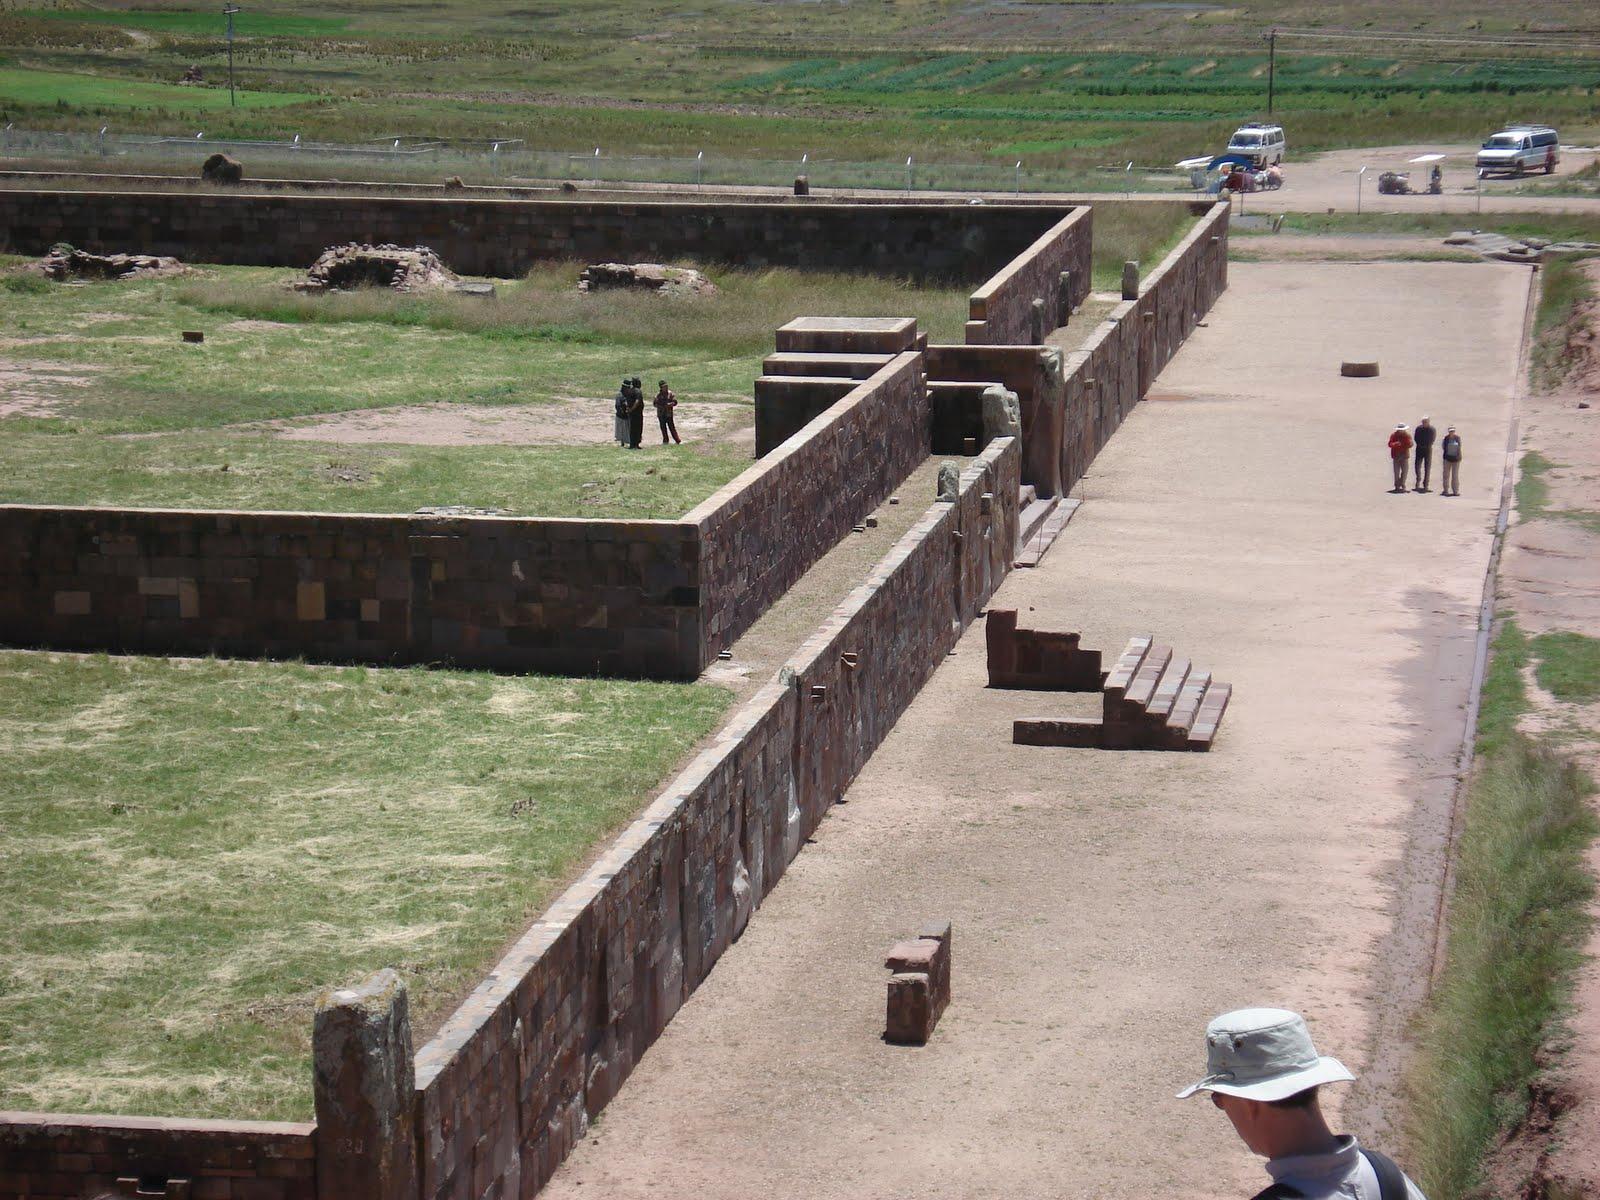 Ancient Akapana Pyramid Pumapunku Tiwanaku